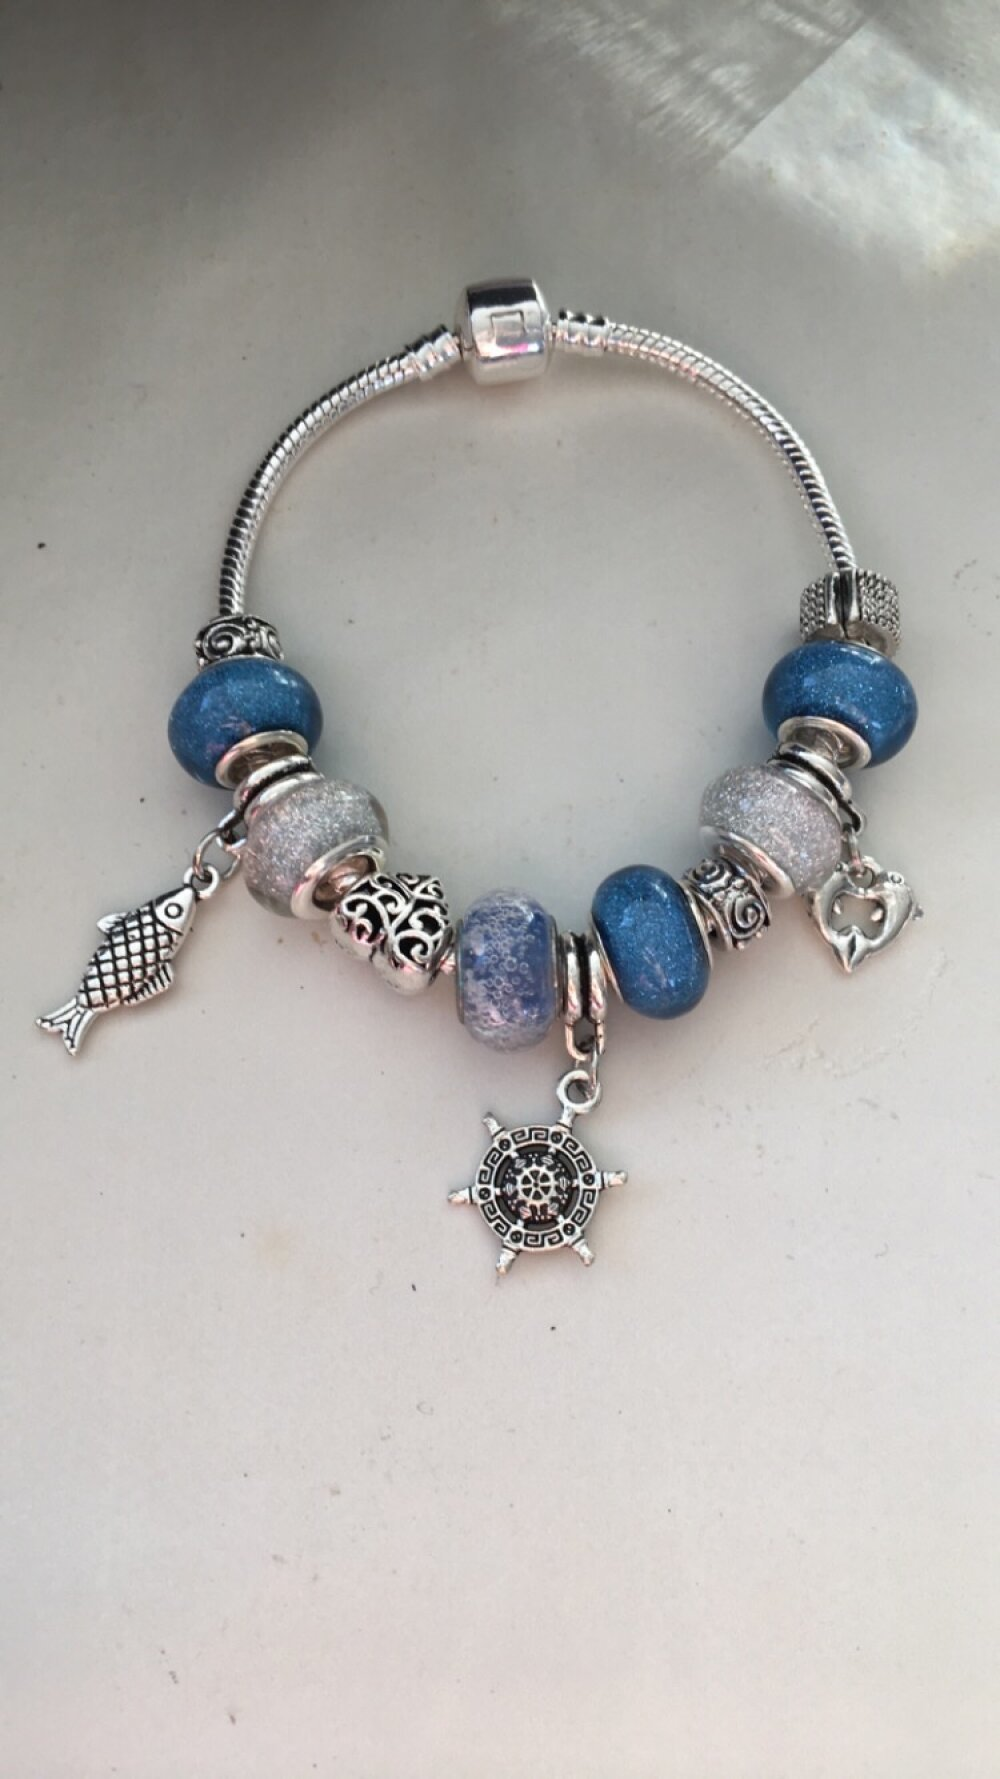 bijoux pandora bleu